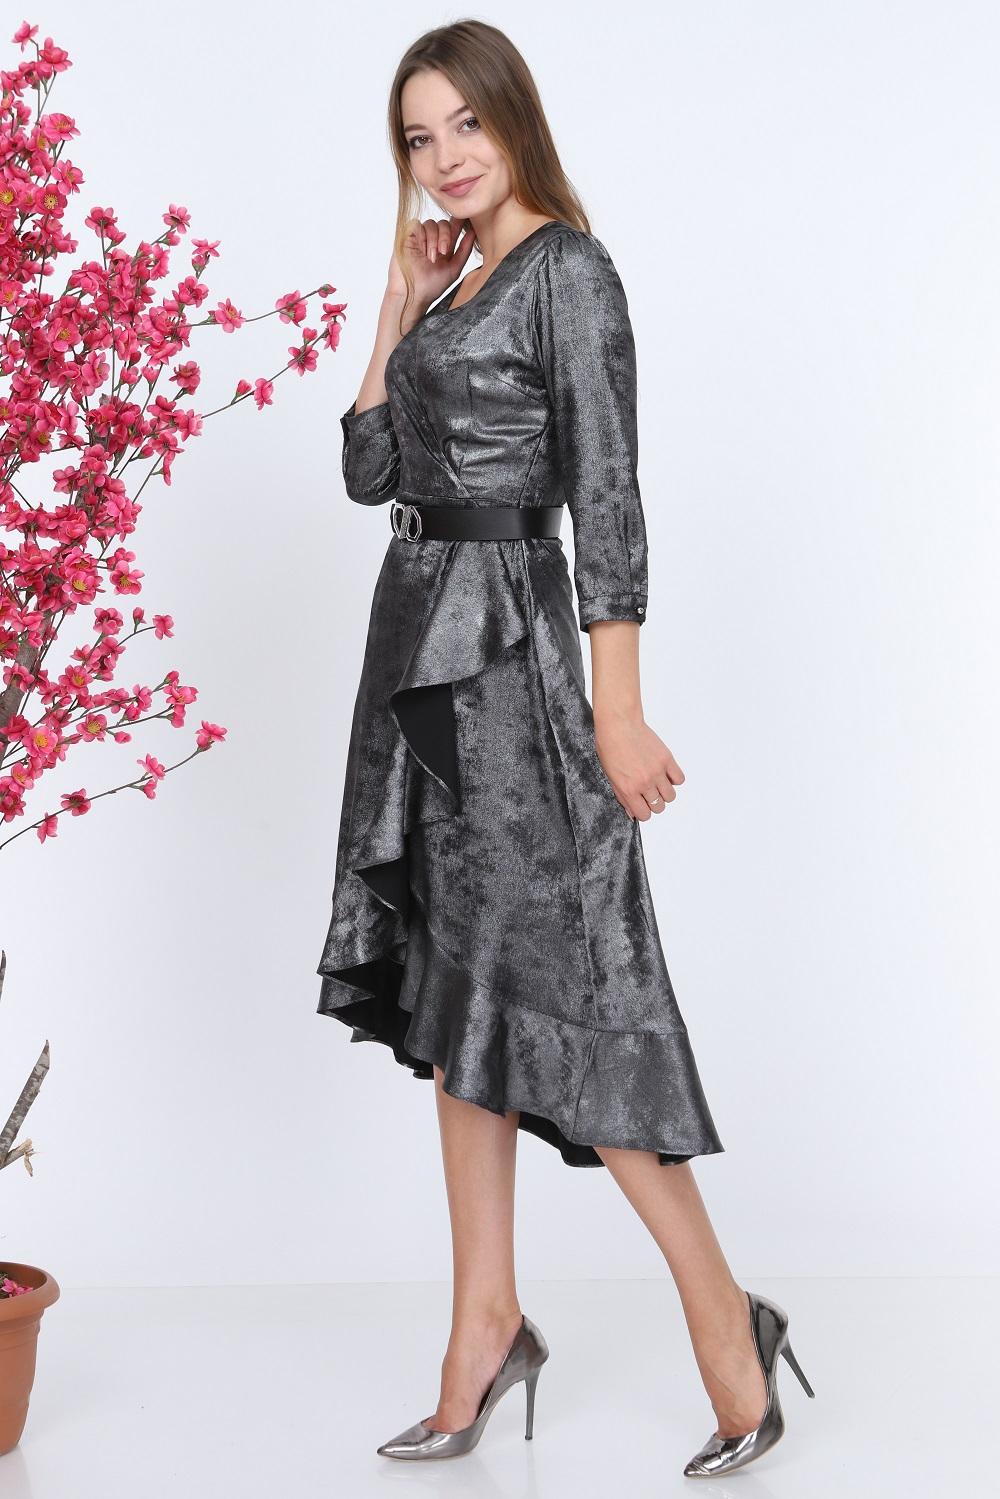 Shiny Fabric Silver Dress